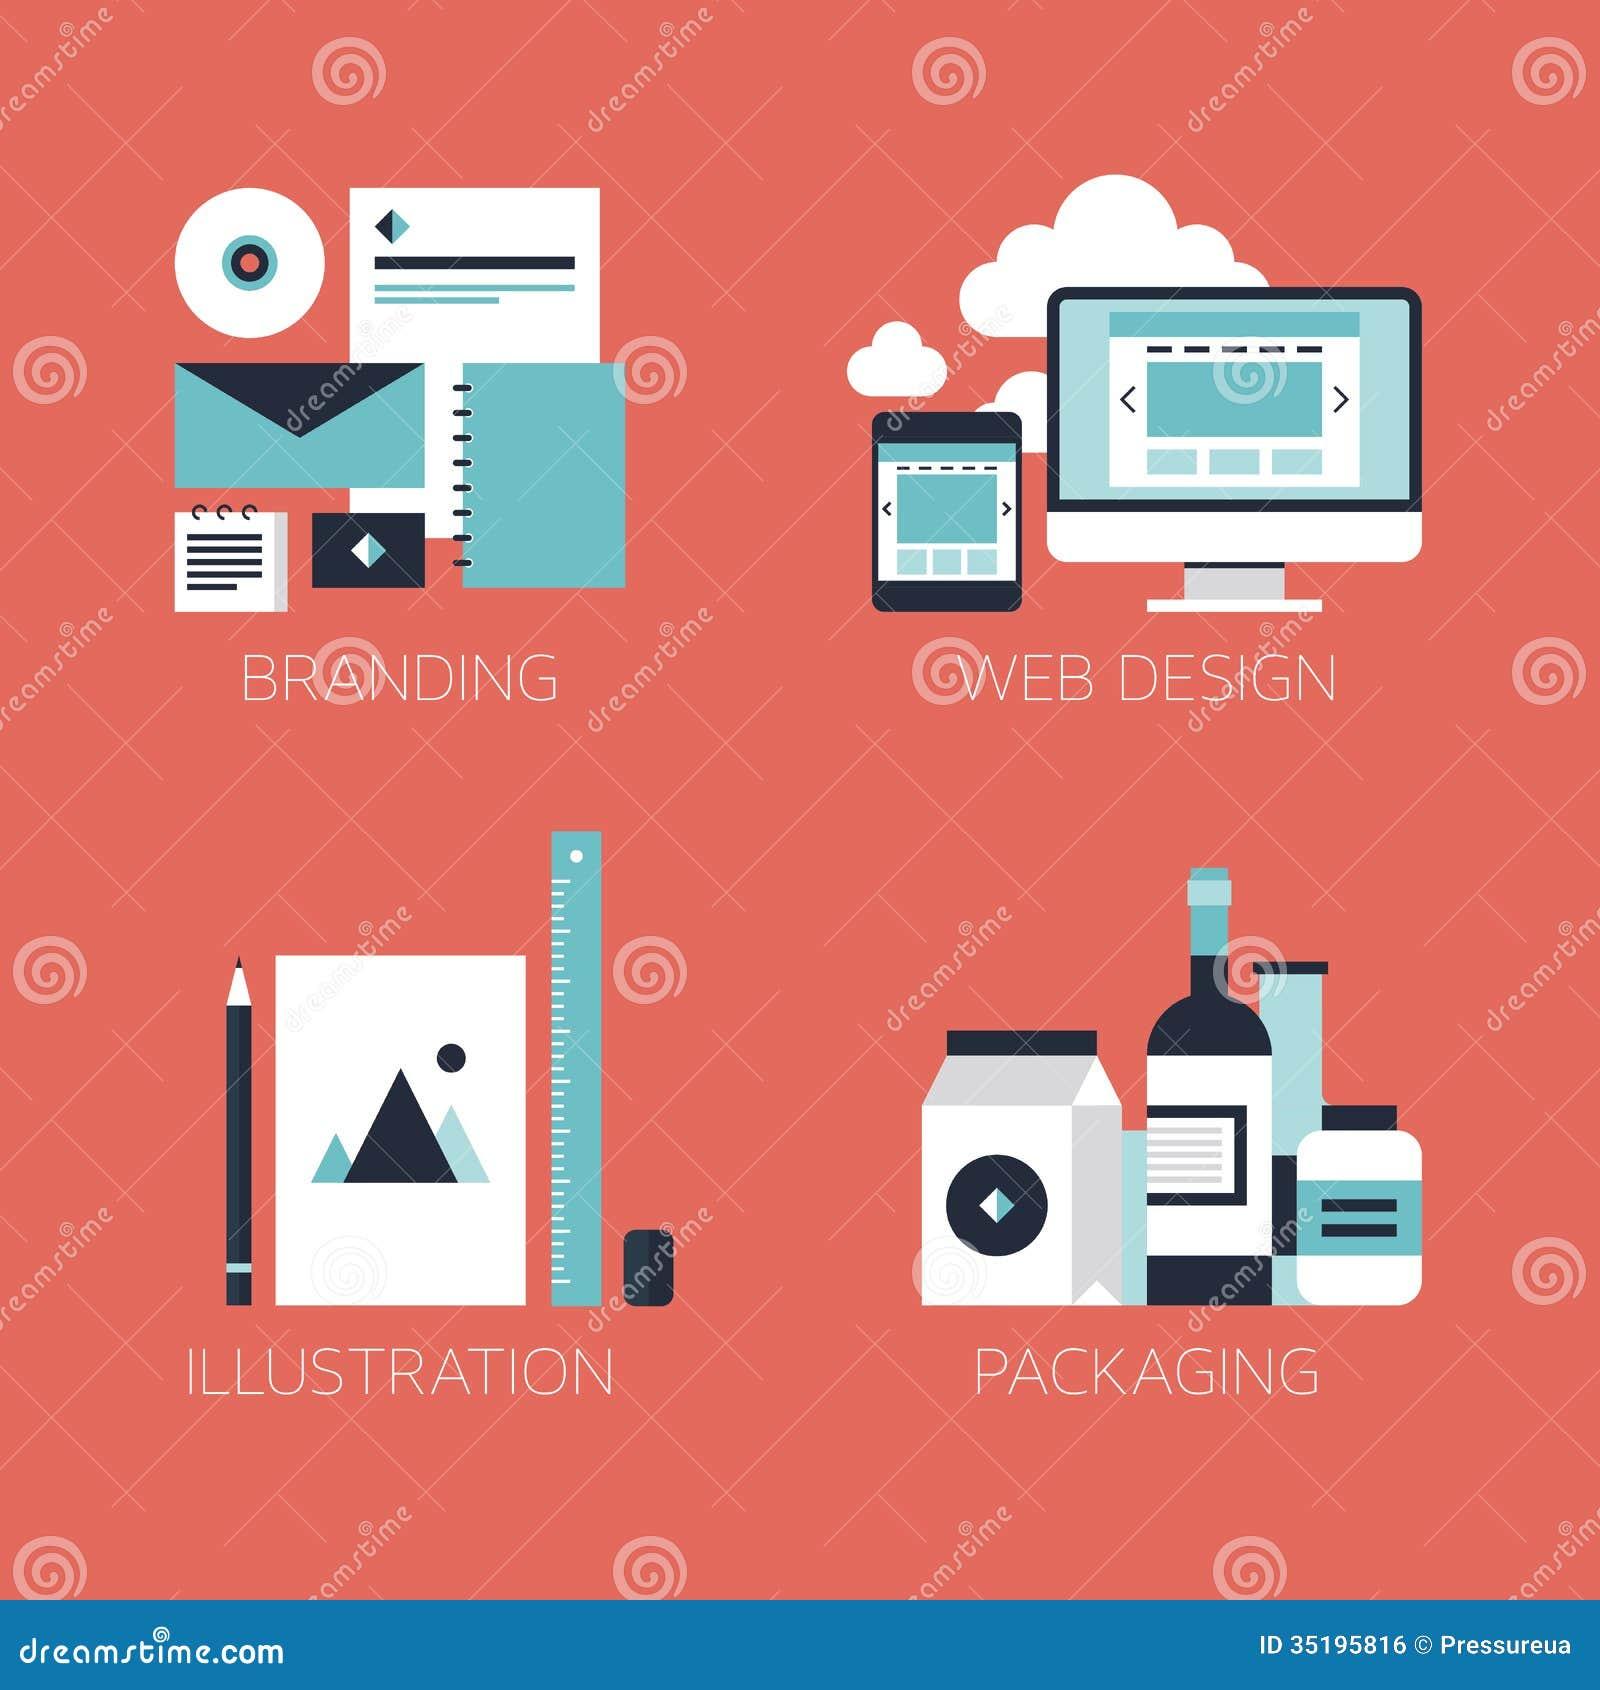 Flat Design Corporate Style Icons Royalty Free Stock Image Image 35195816